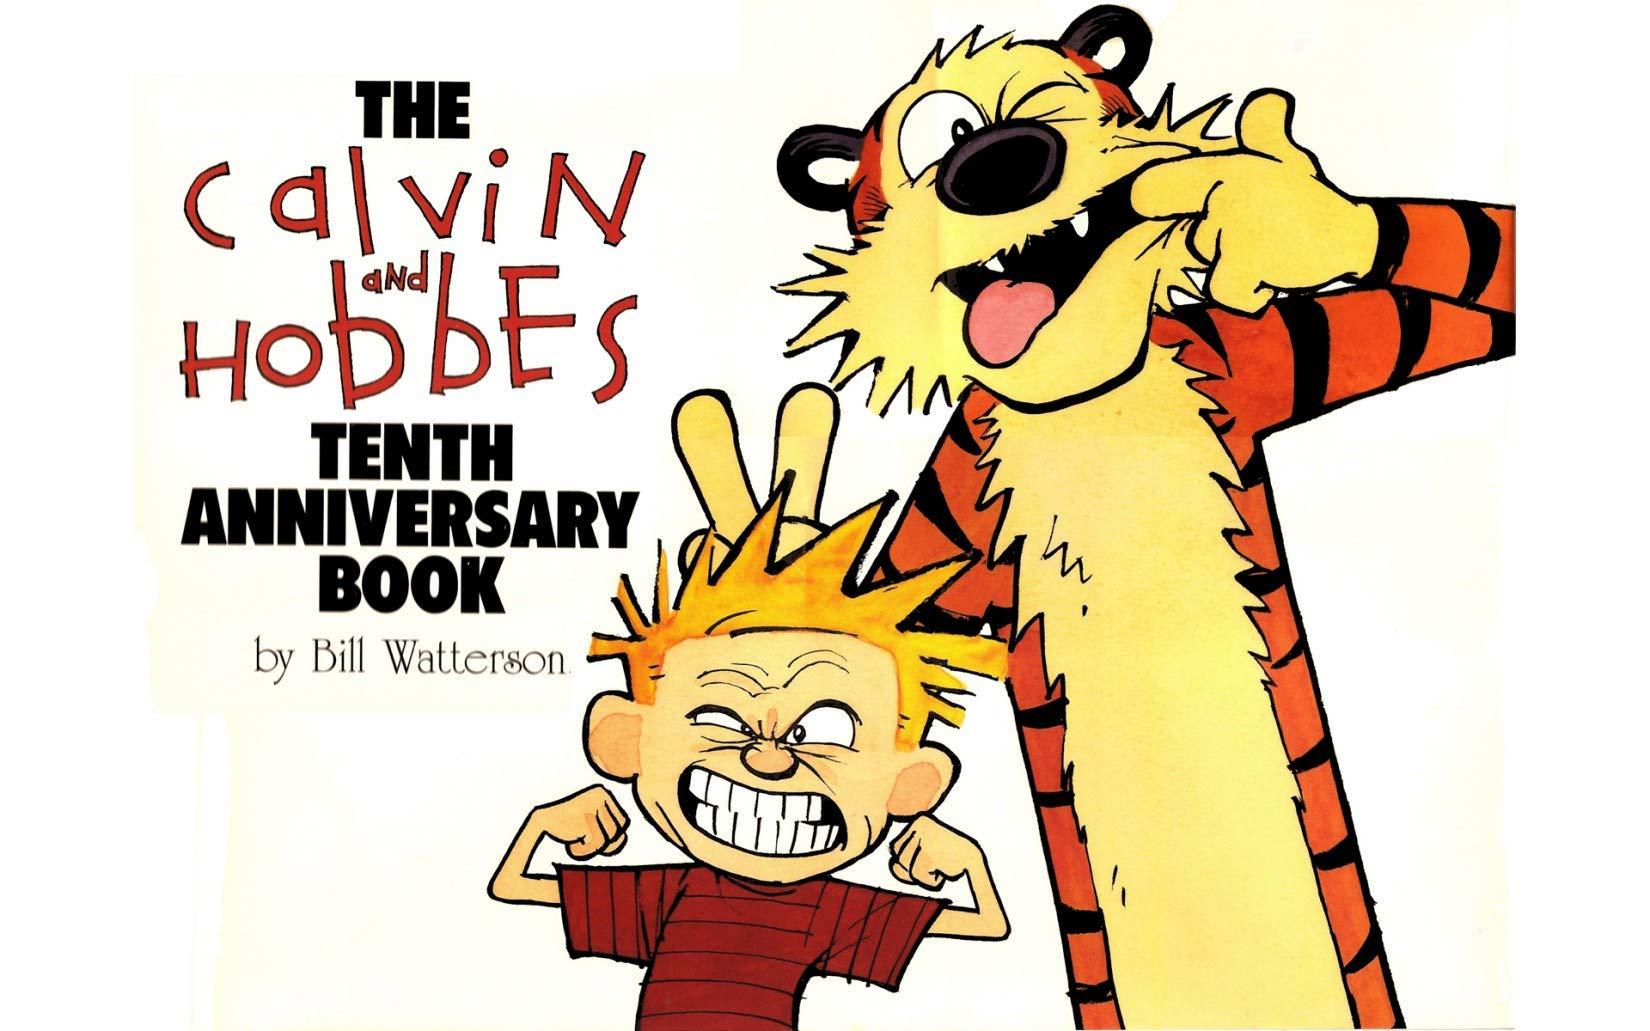 Calvin and Hobbes: Vol 13 Great Advanture Cartoon Comics Books For Kids, Boys , Girls , Fans , Adults